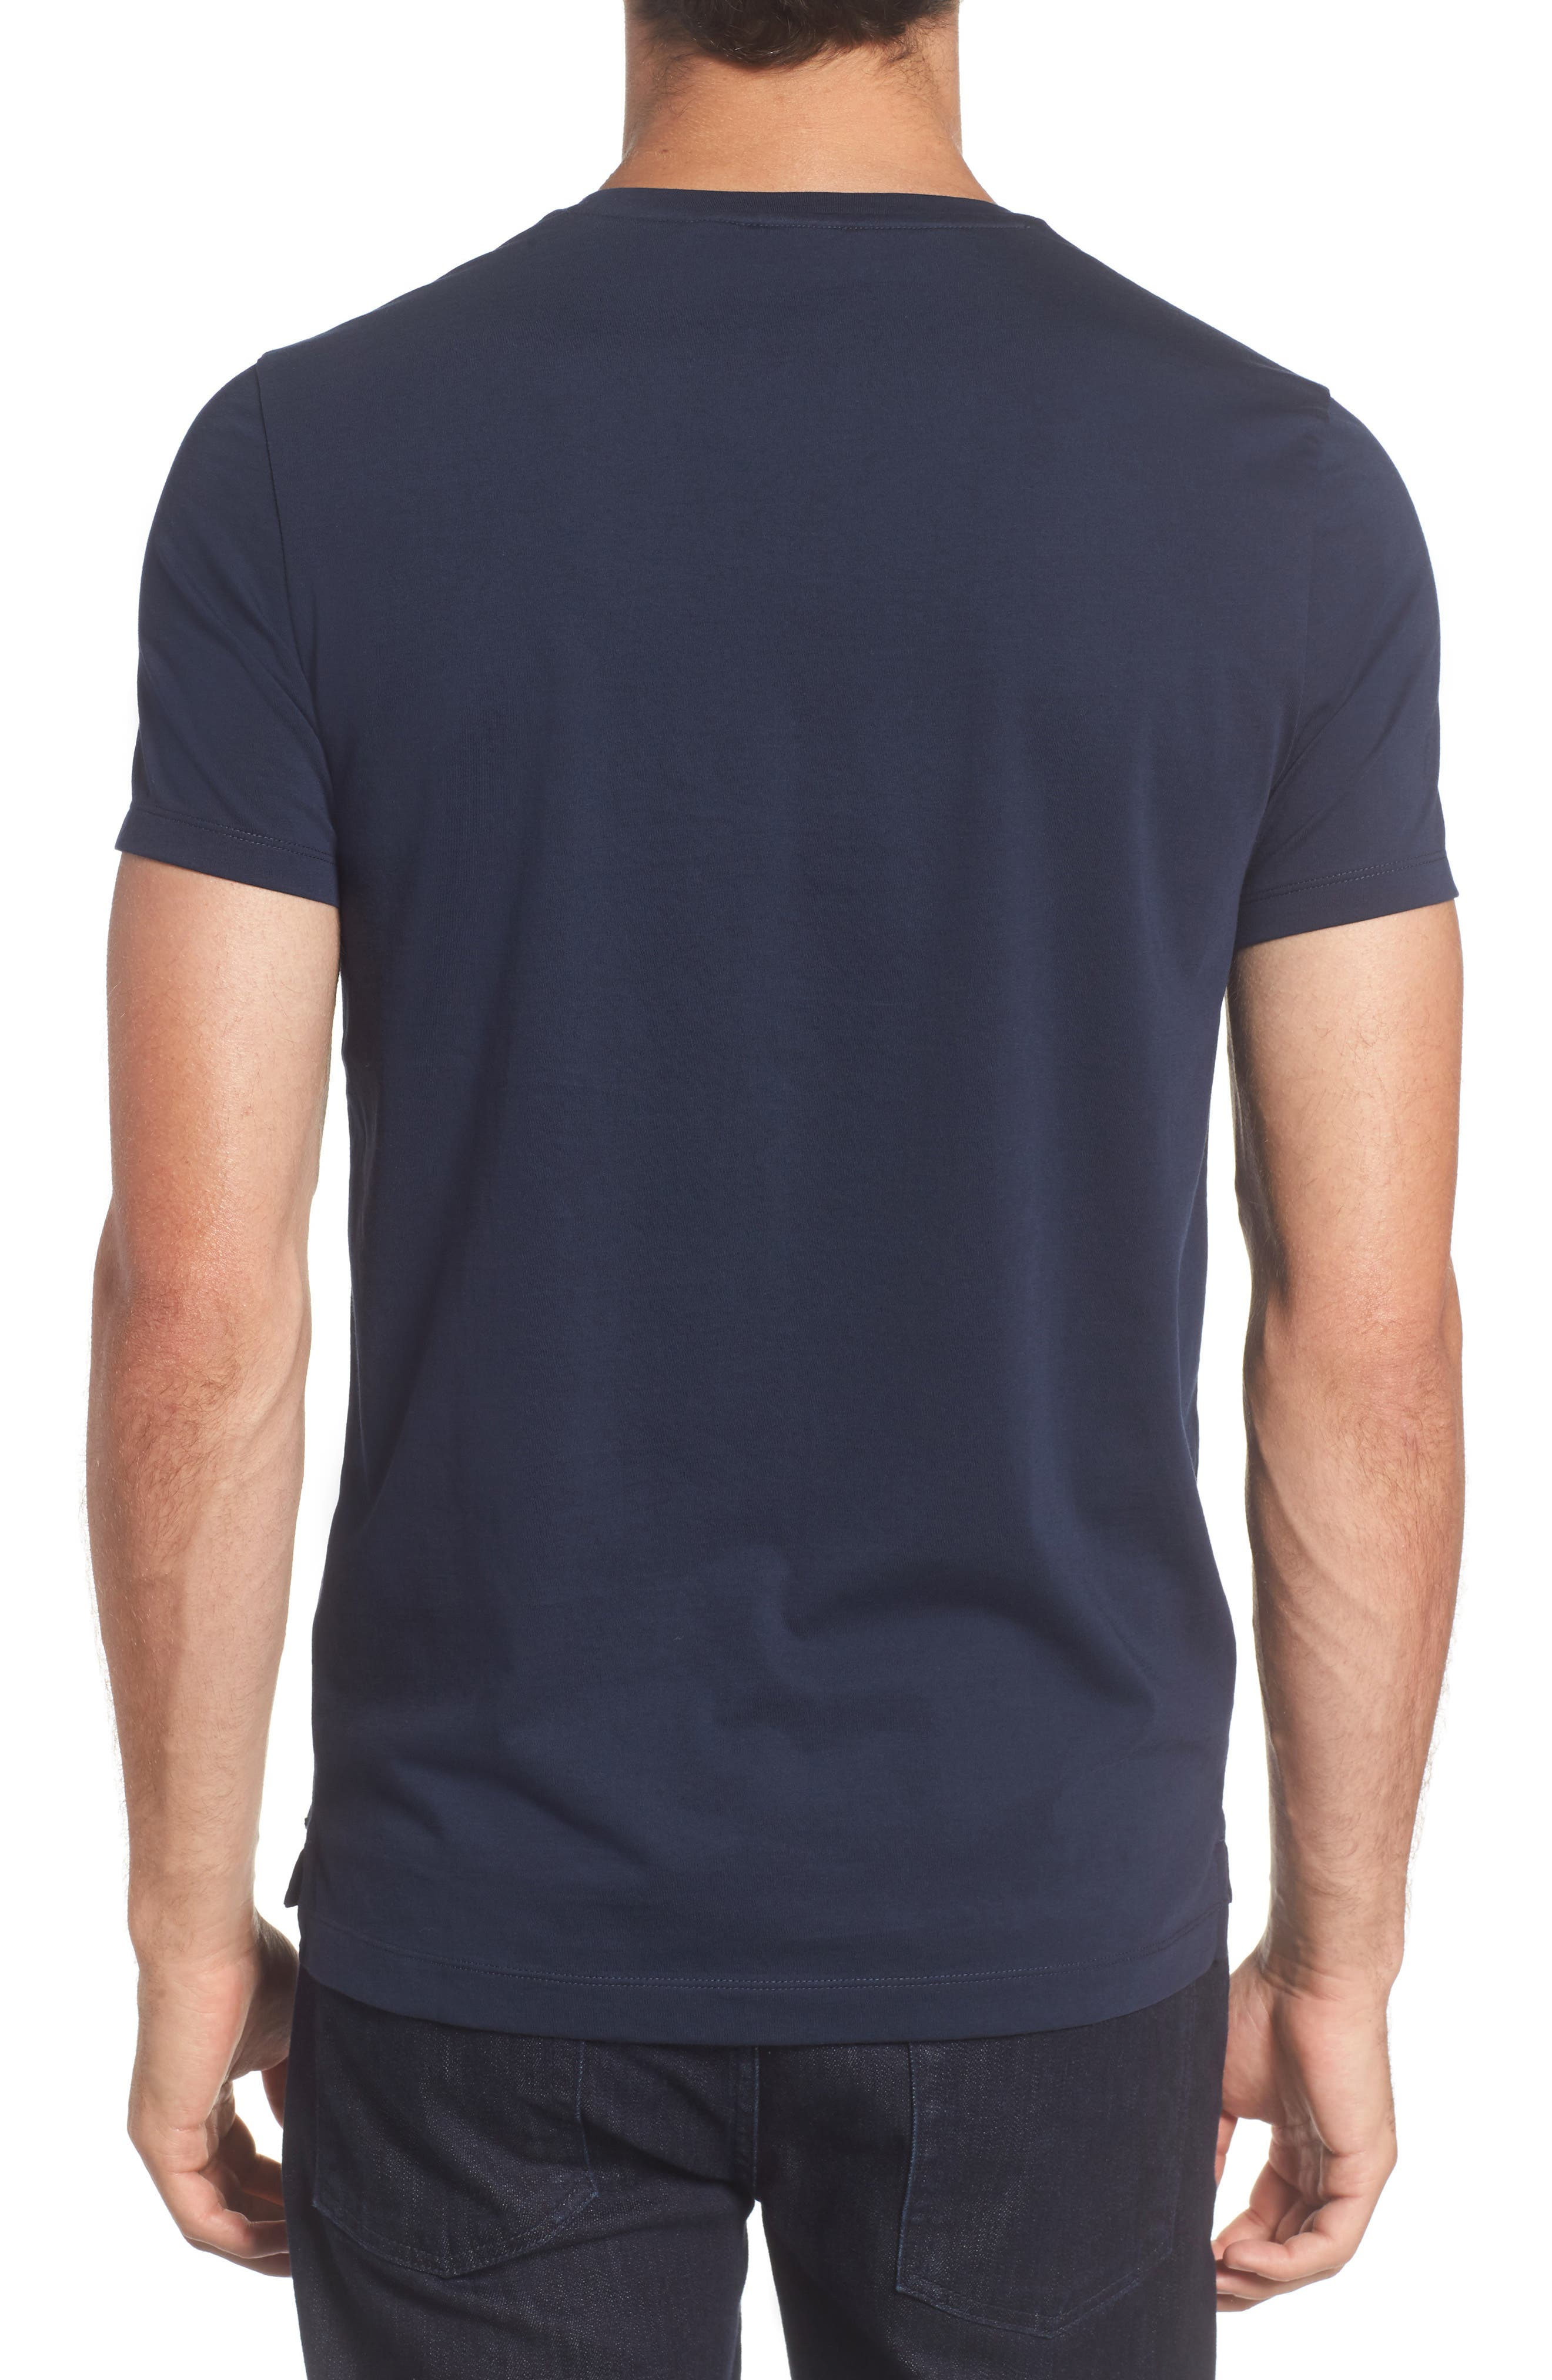 Tessler Crewneck T-Shirt,                             Alternate thumbnail 2, color,                             Black